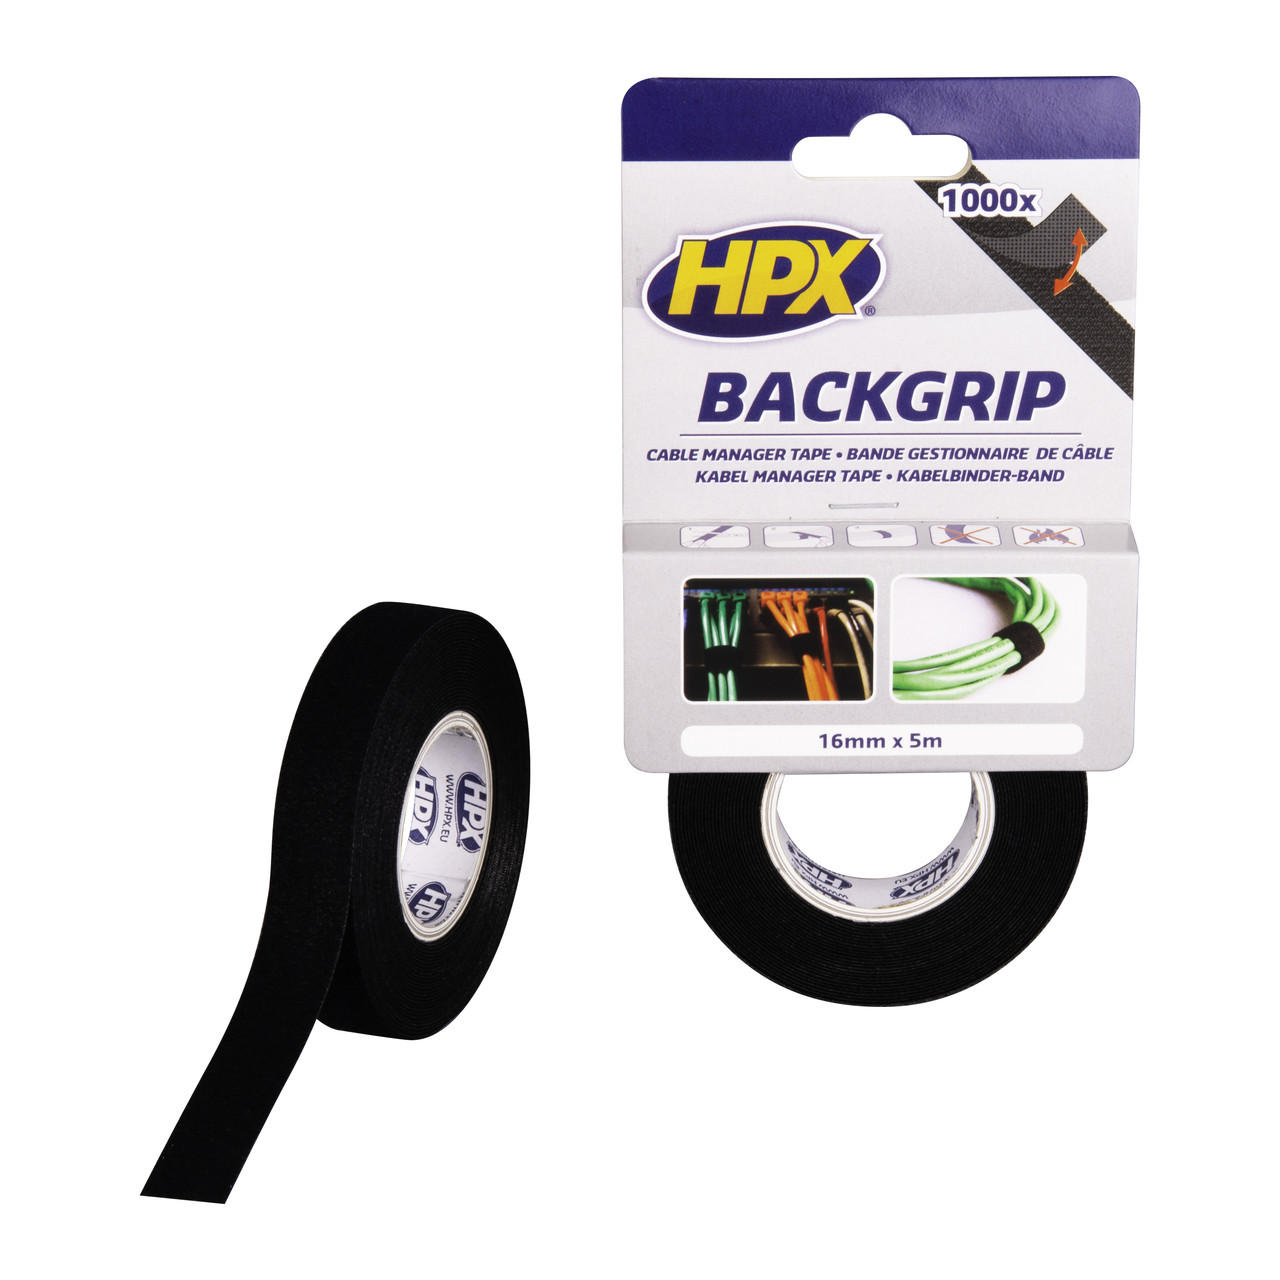 HPX BACKGRIP - Стяжка-липучка для бандажа кабелей 16мм x 5м х 1.25мм, чёрная, для многократных креплений